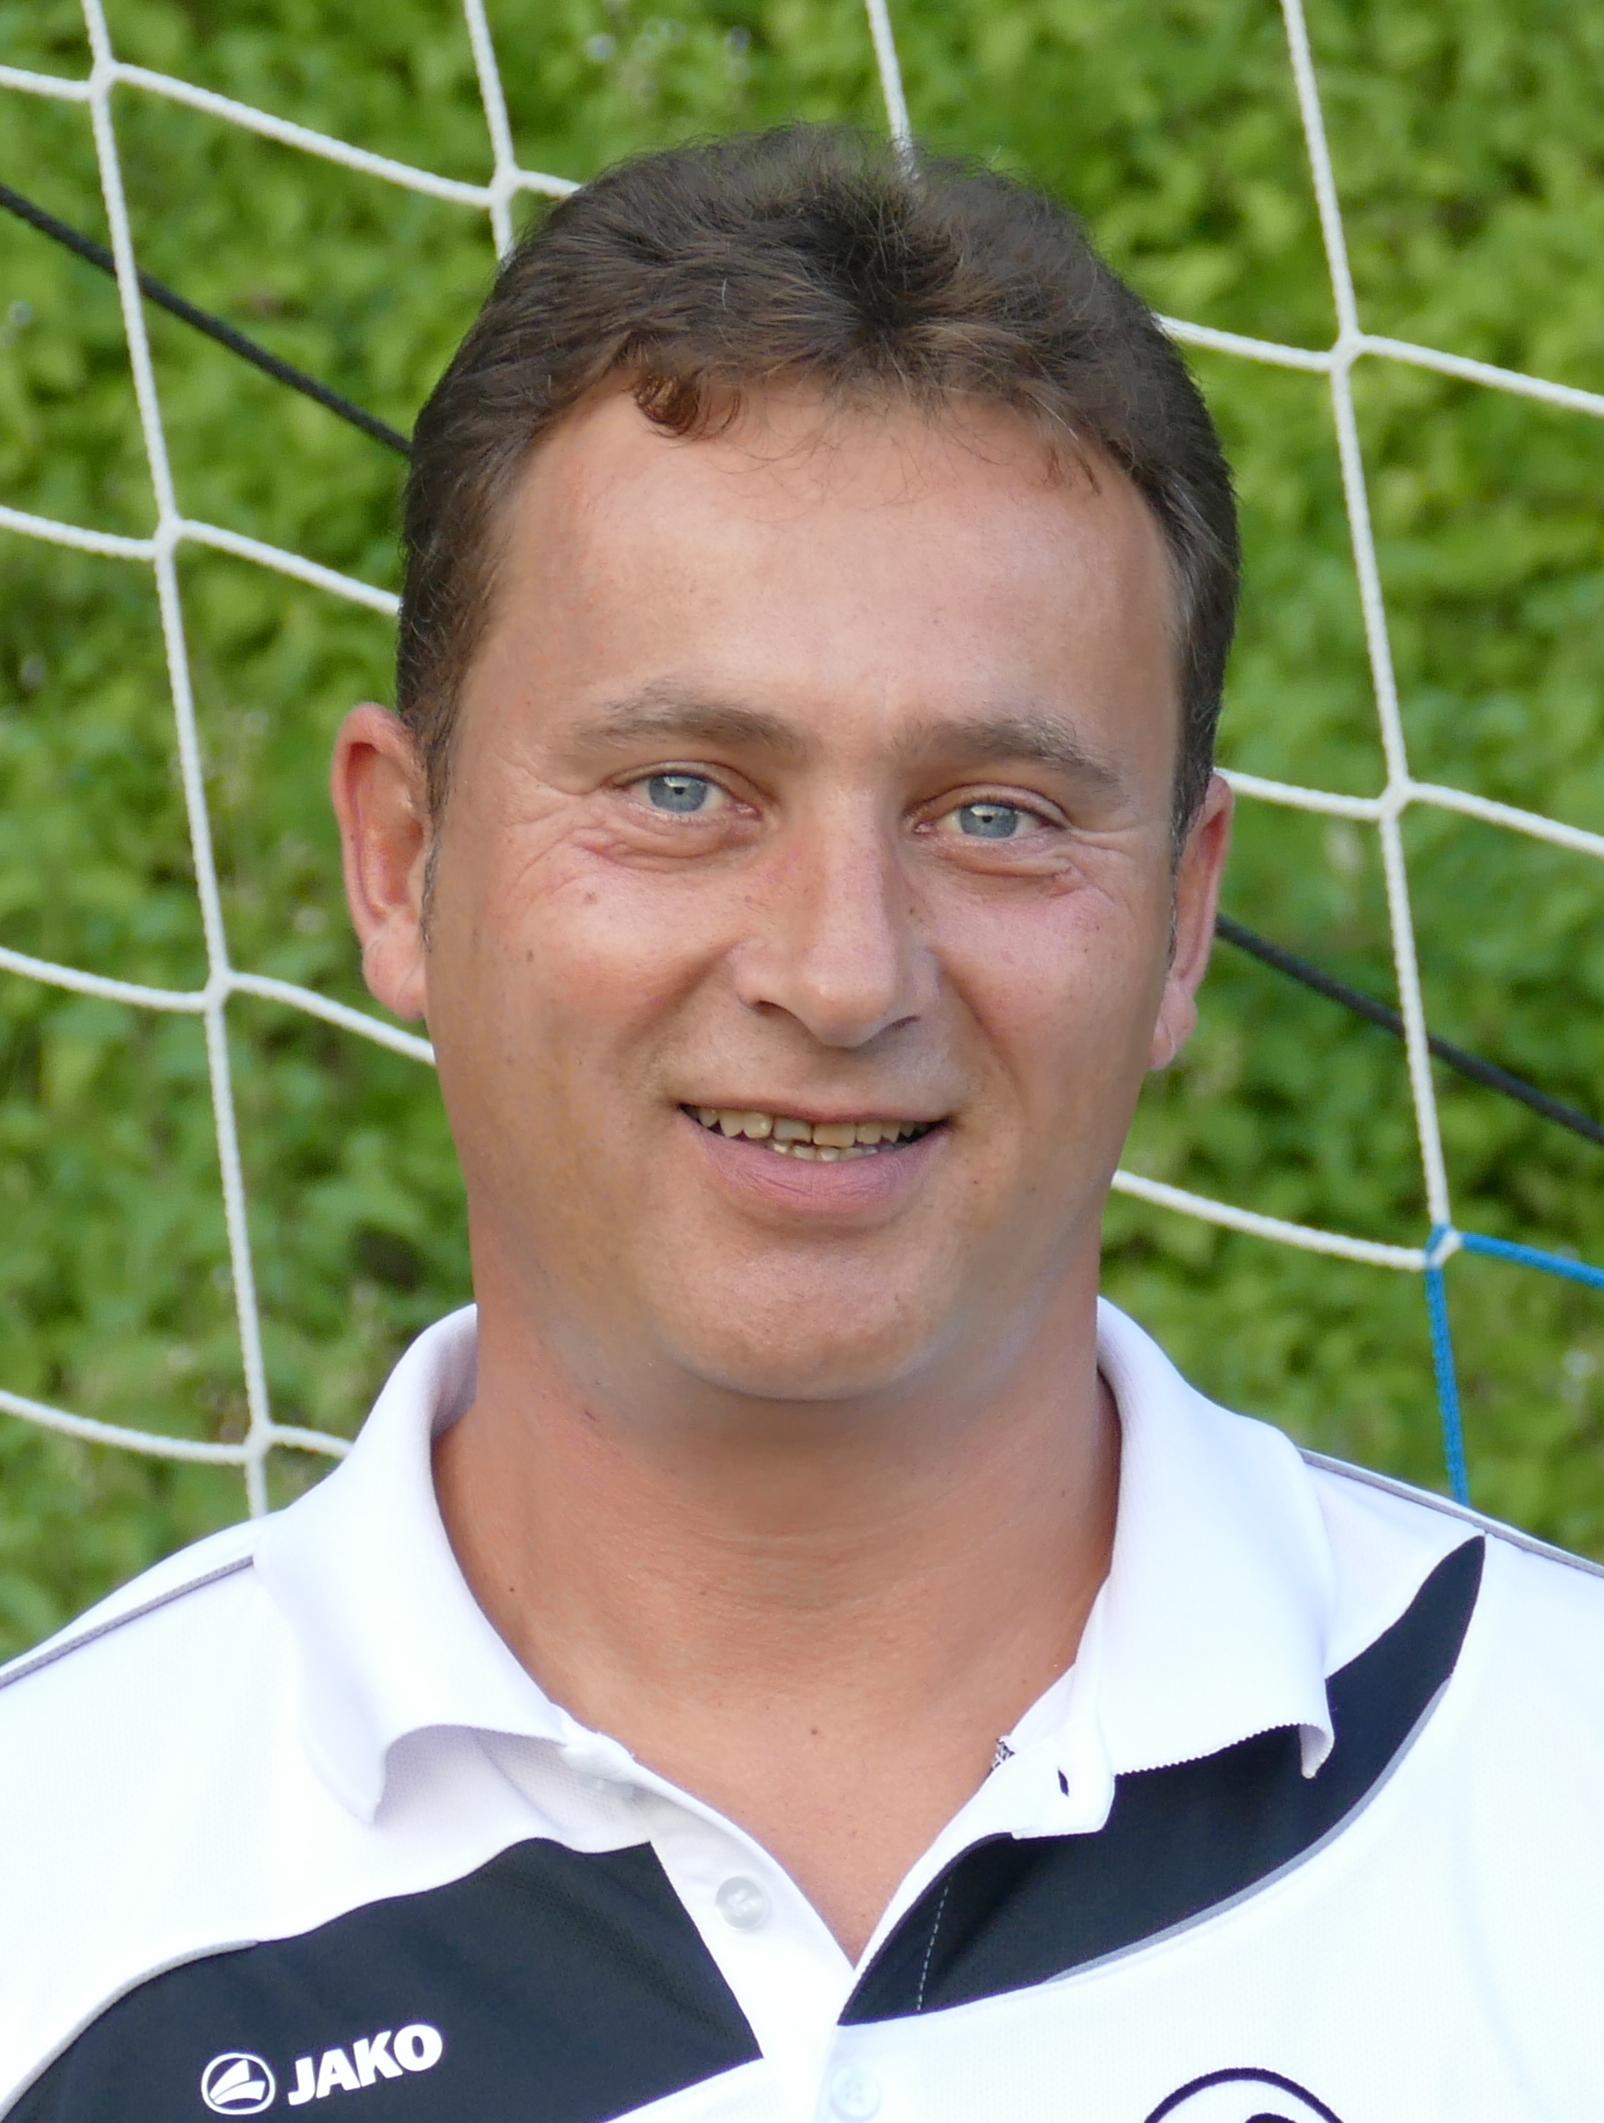 Stefan Miklosko